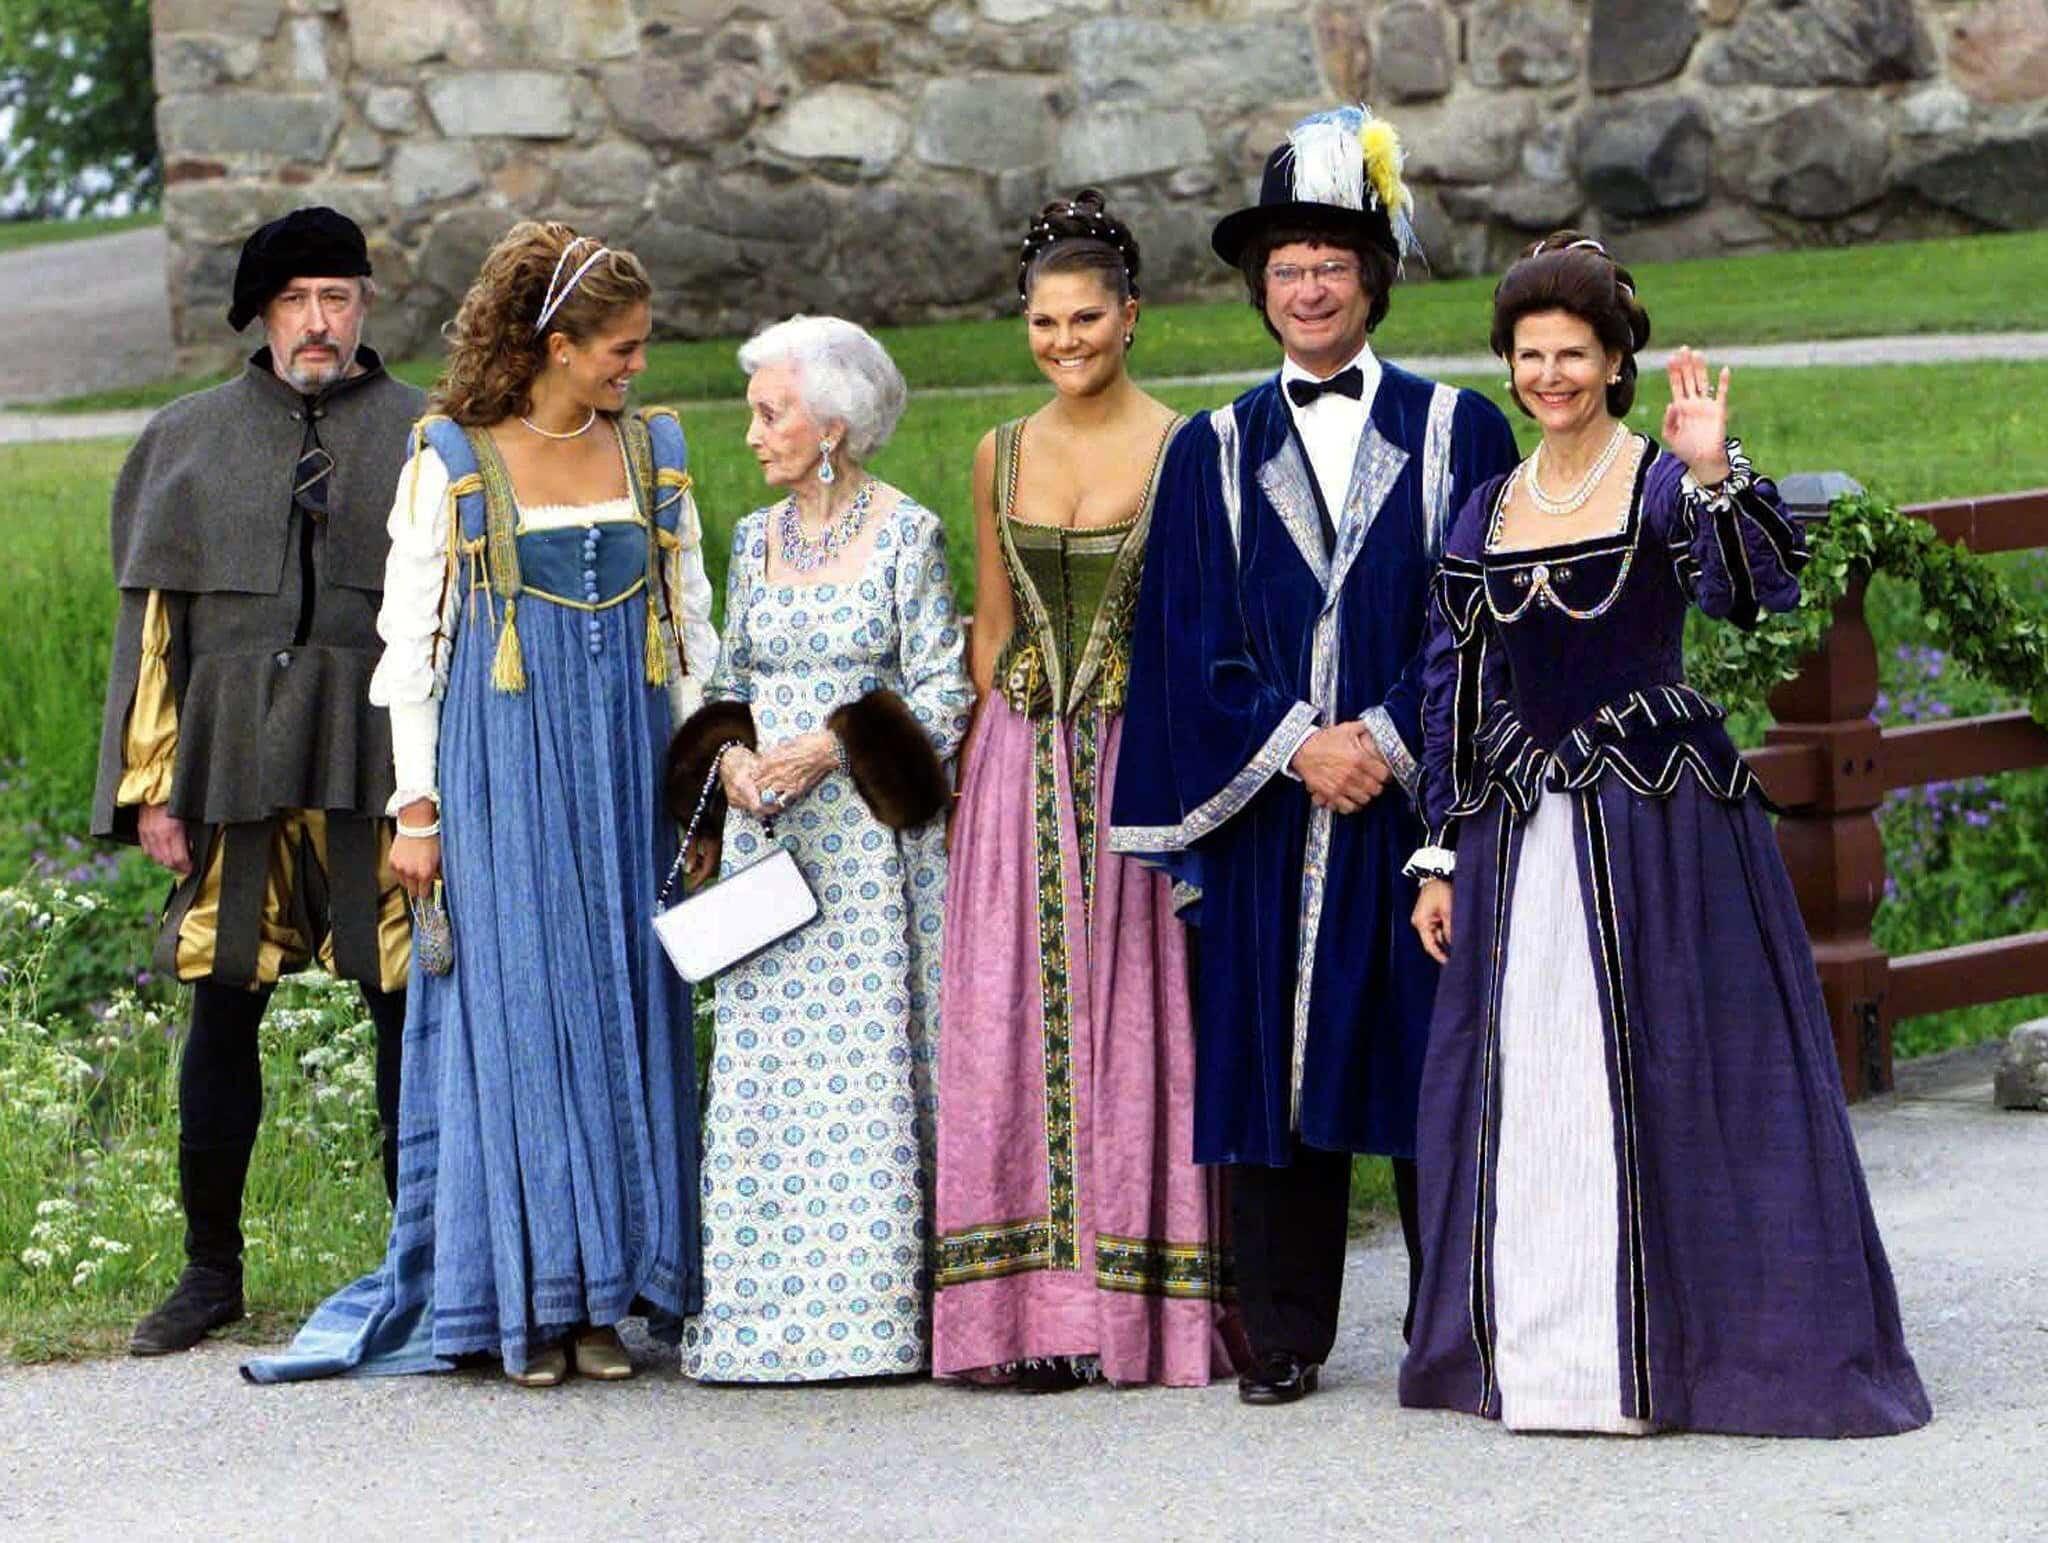 Royals verkleidet